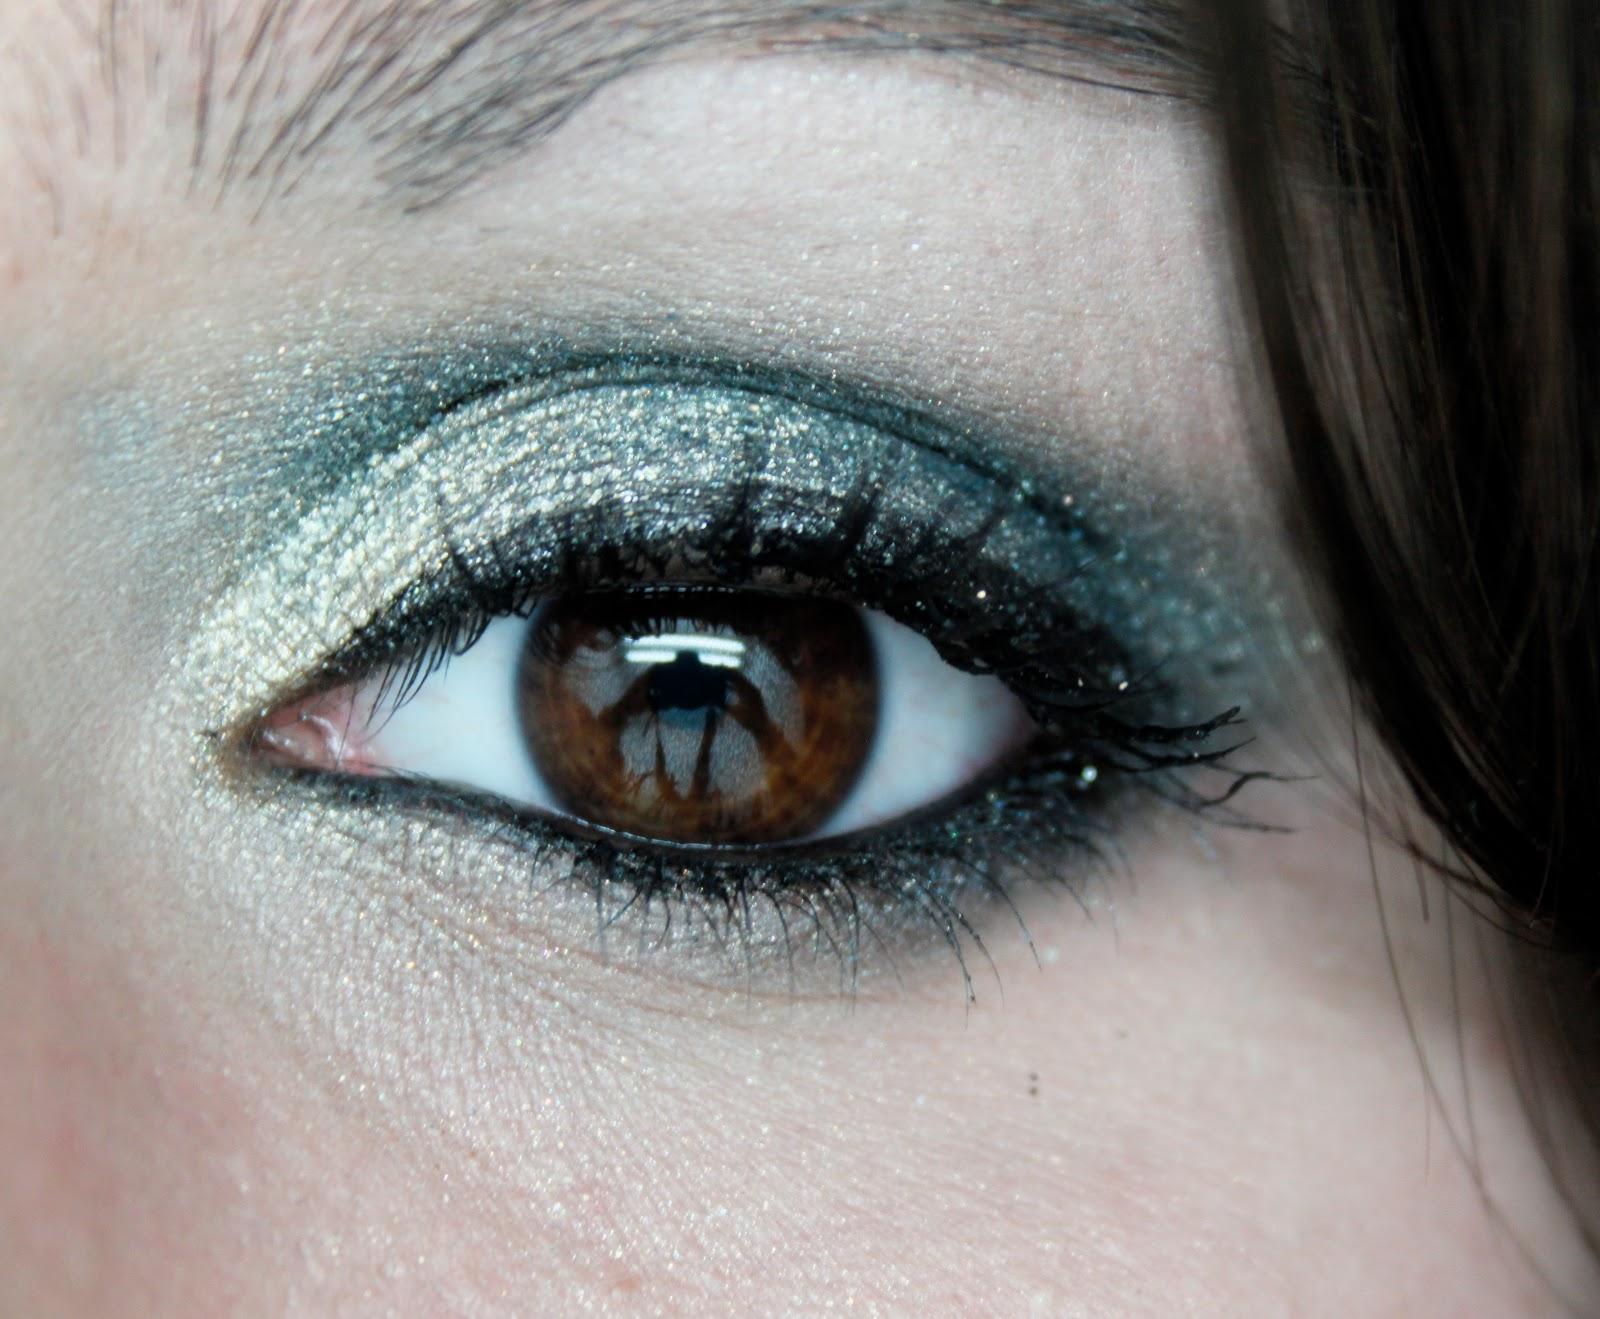 Maquillage pour yeux marron vert beautiful tuto photo maquillage dut pour les yeux with - Fard a paupiere yeux marrons ...